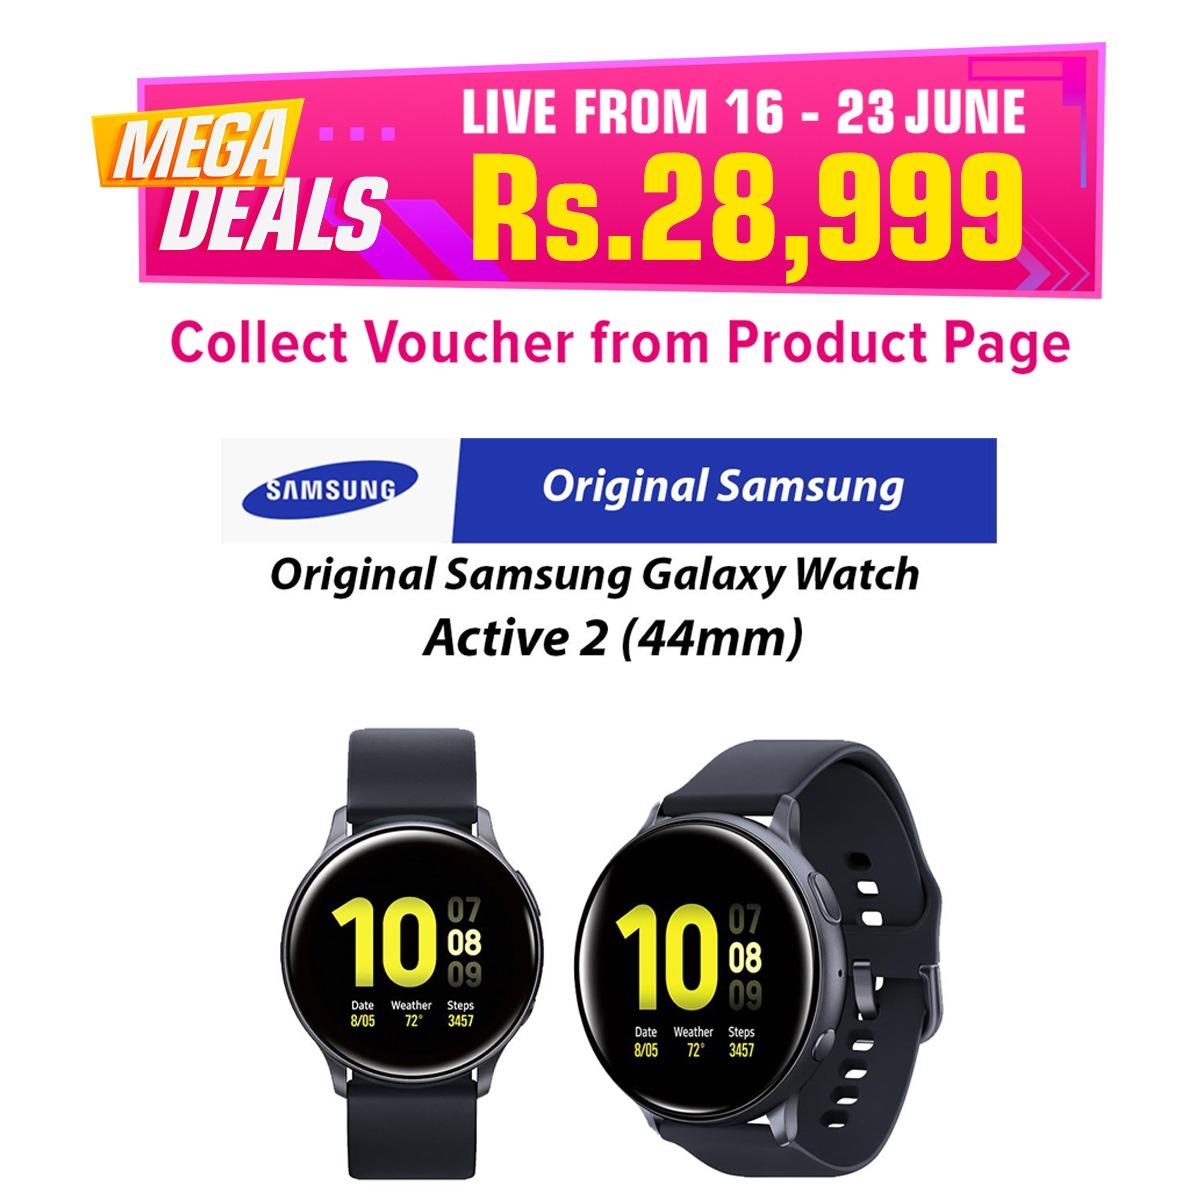 Samsung Galaxy Watch Active 2 Bluetooth (44mm) Fitness Watch/ Fitness Tracker Black SM-R820NZKAXAR